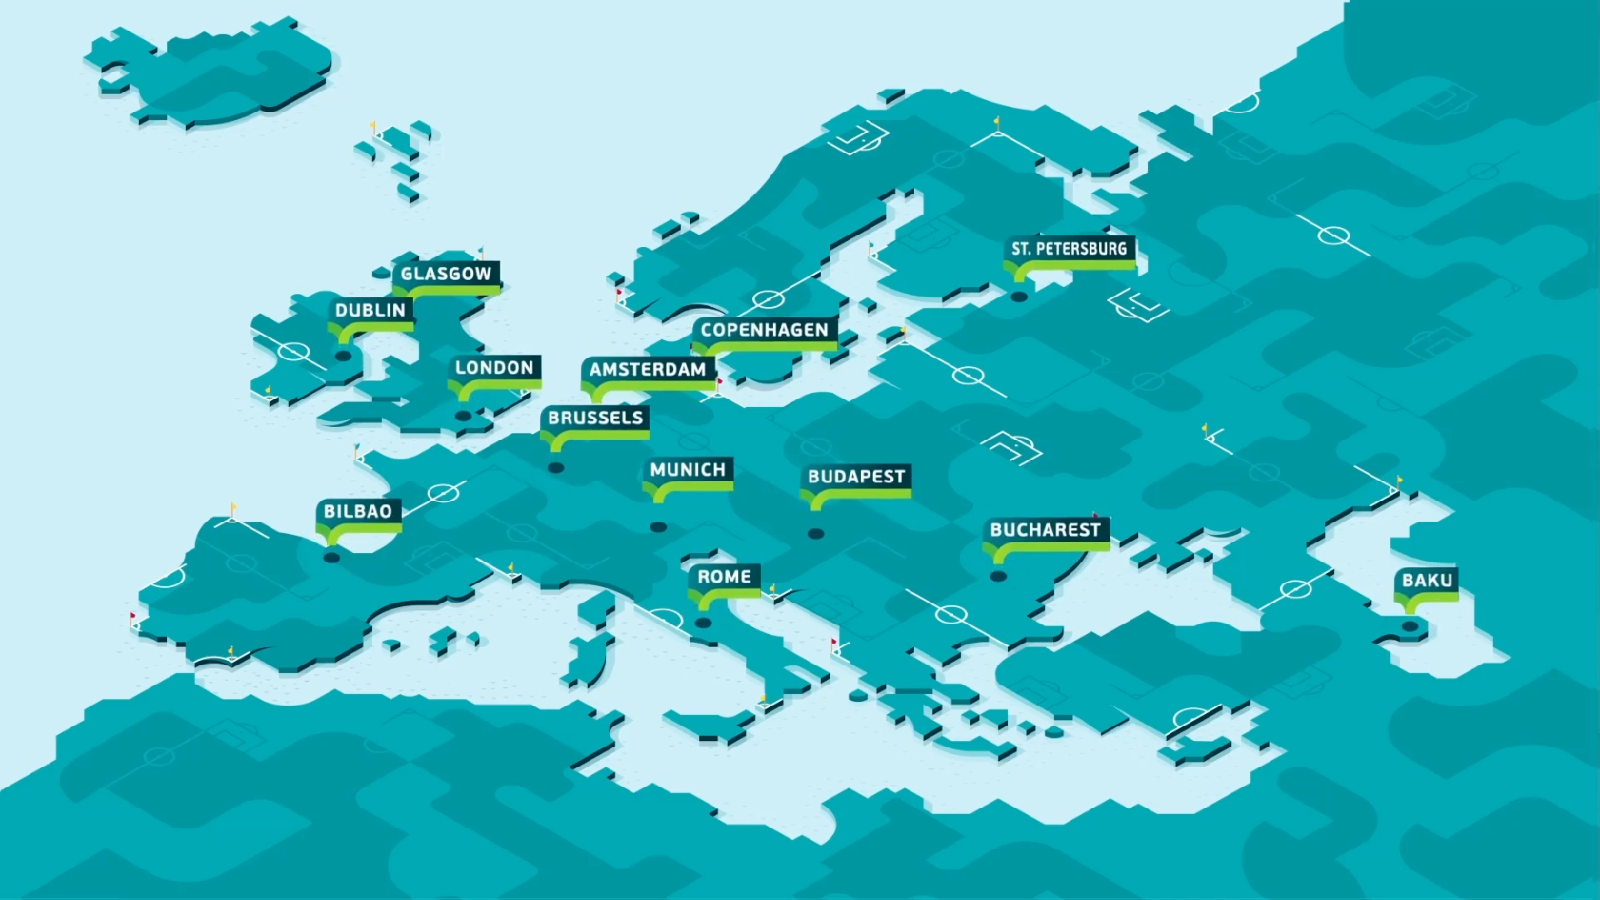 UEFA EURO 2020 Map 2